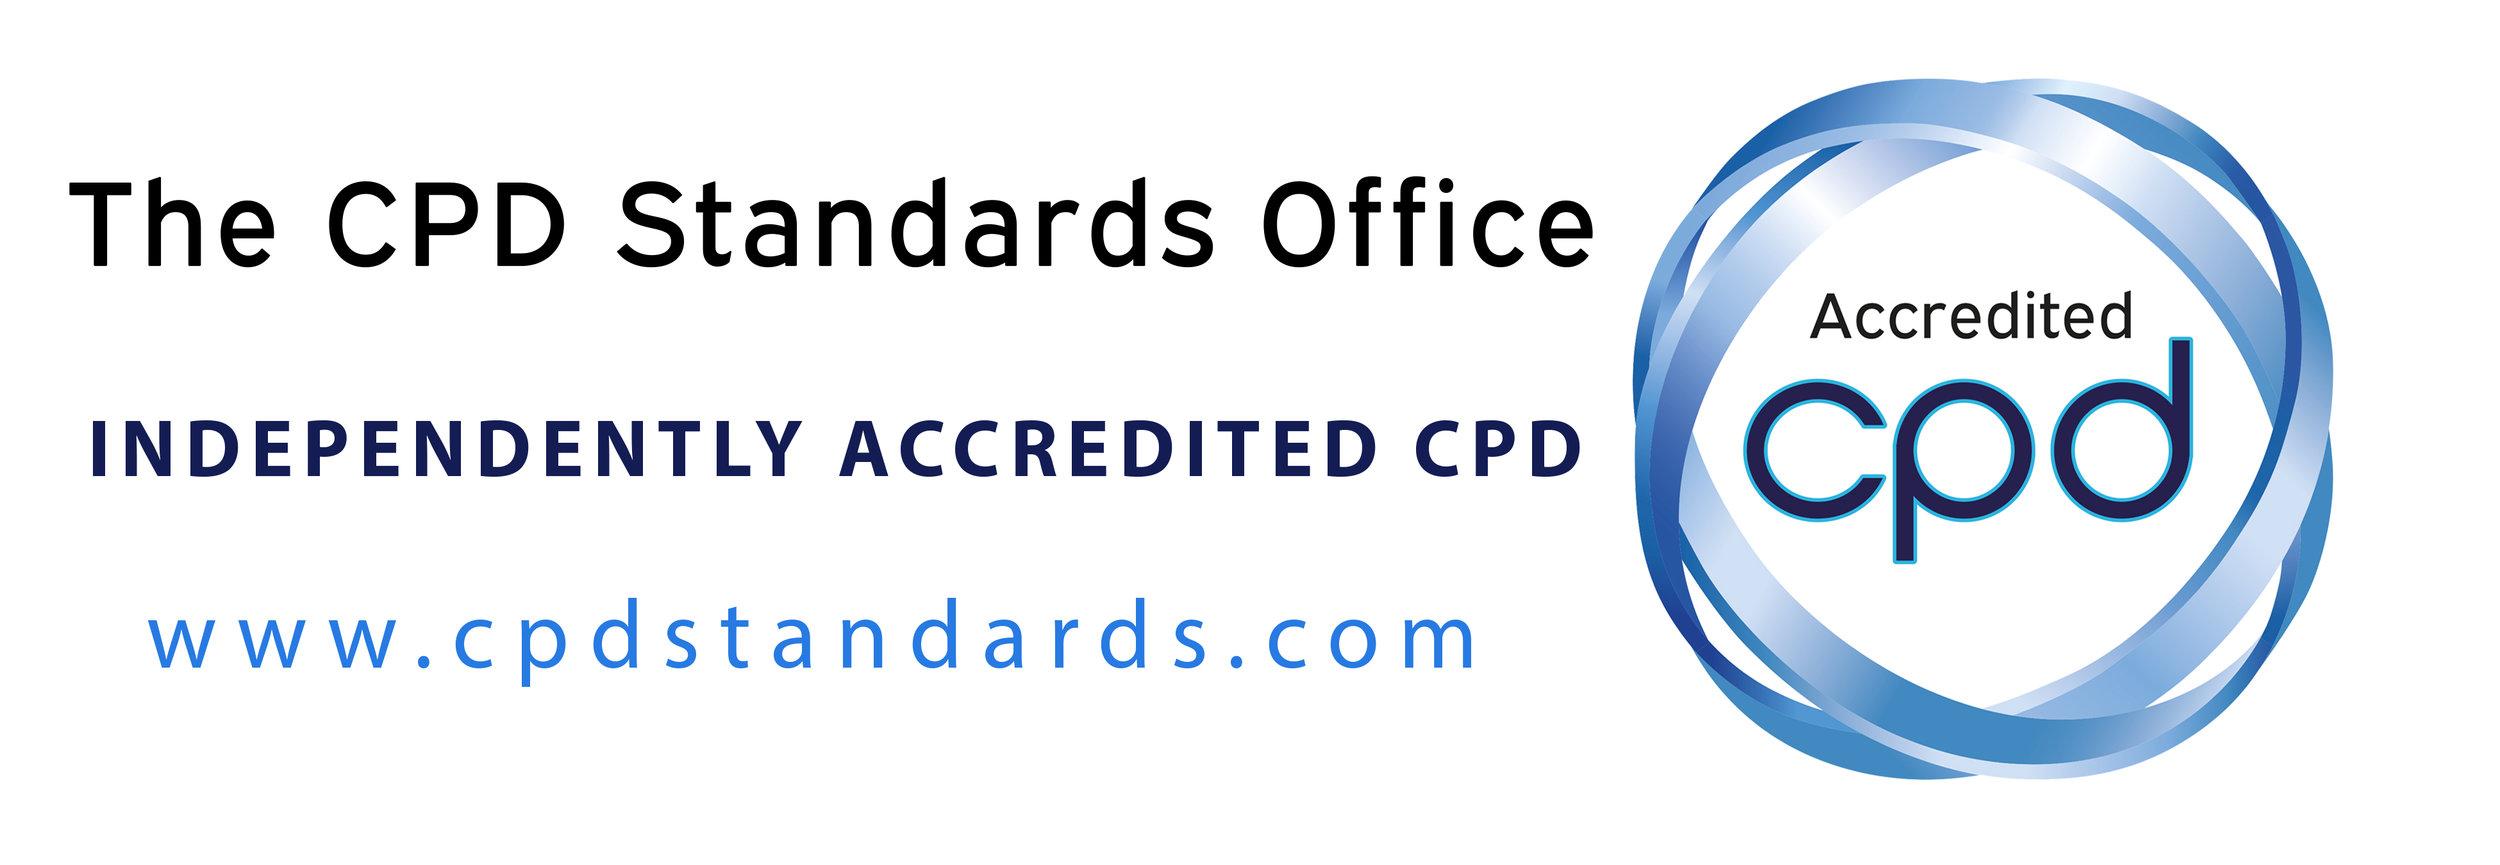 CPD Corporate Header Banner 2019.jpg